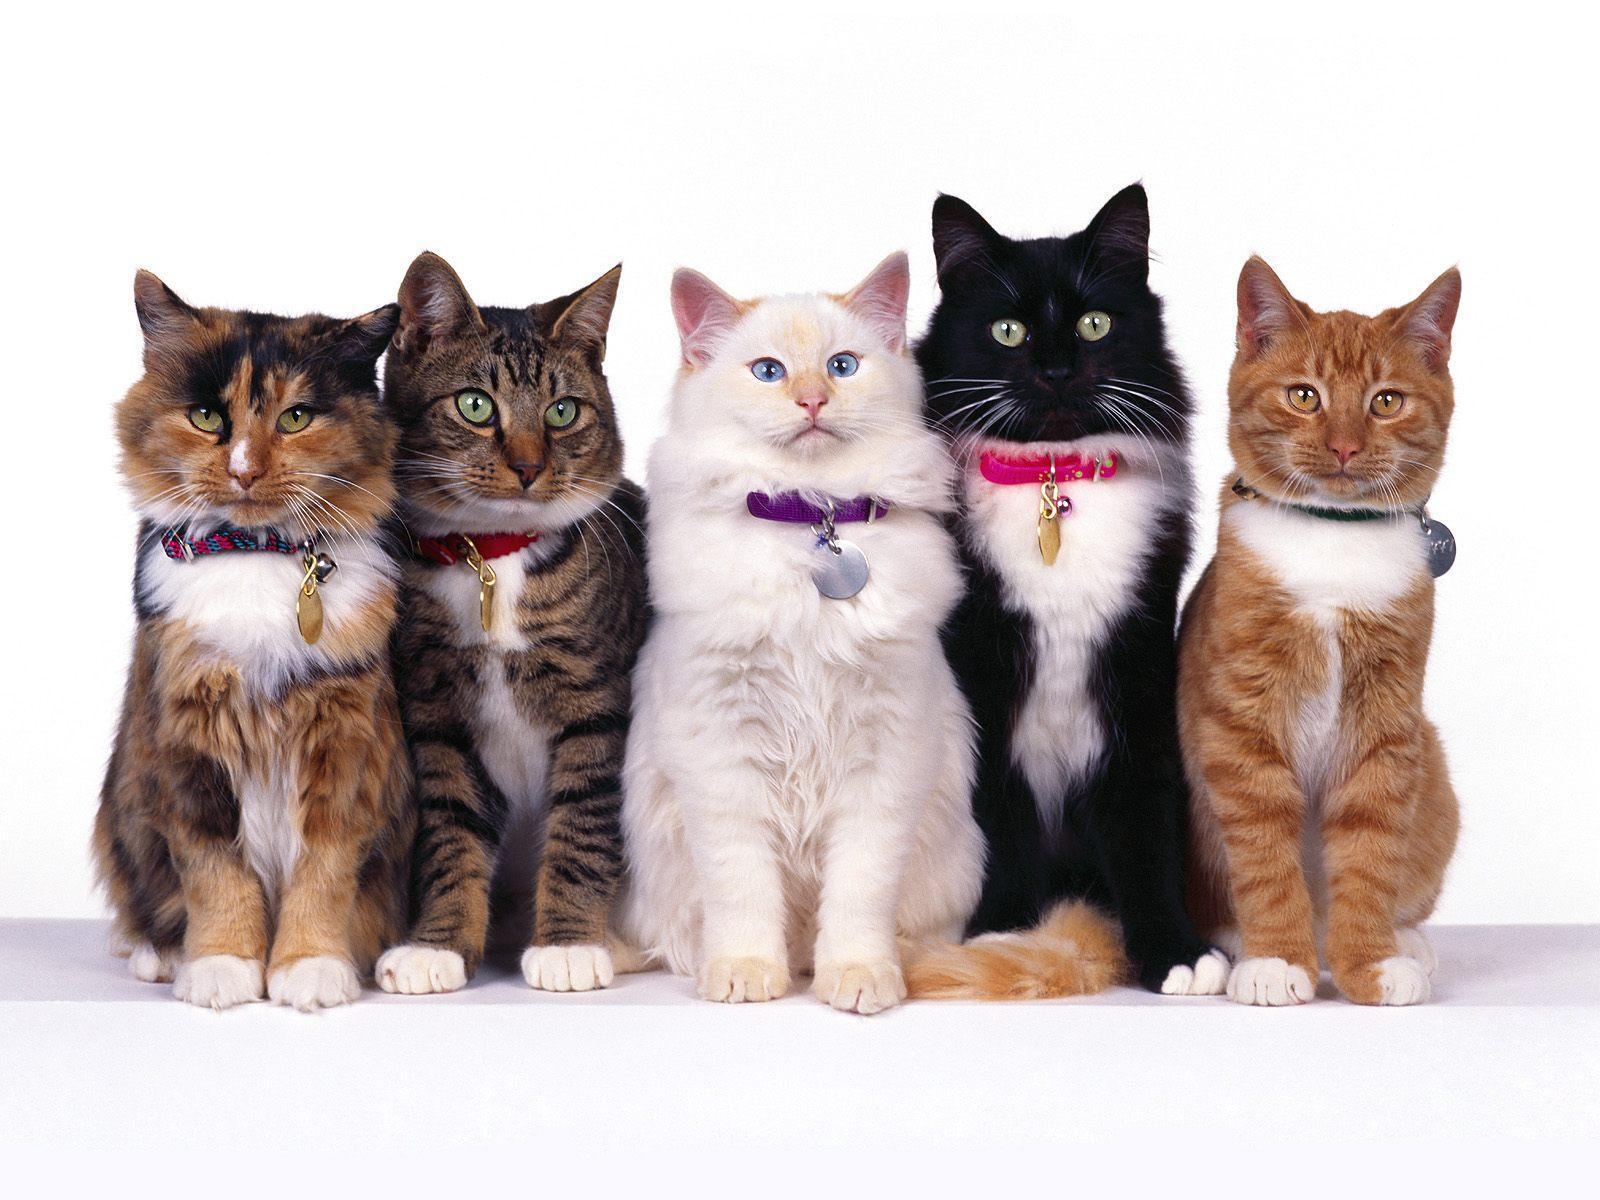 Vrai ou faux ? : les chats